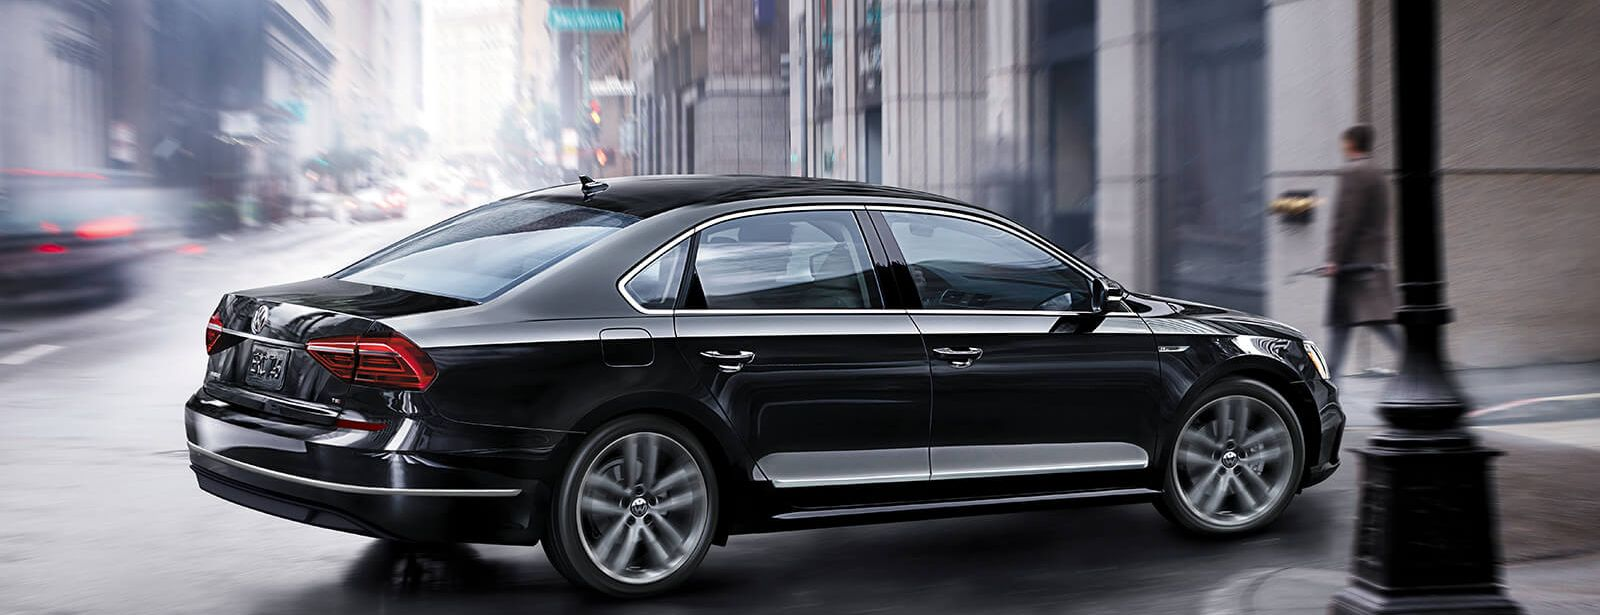 2019 Volkswagen Passat Leasing near Arlington, VA